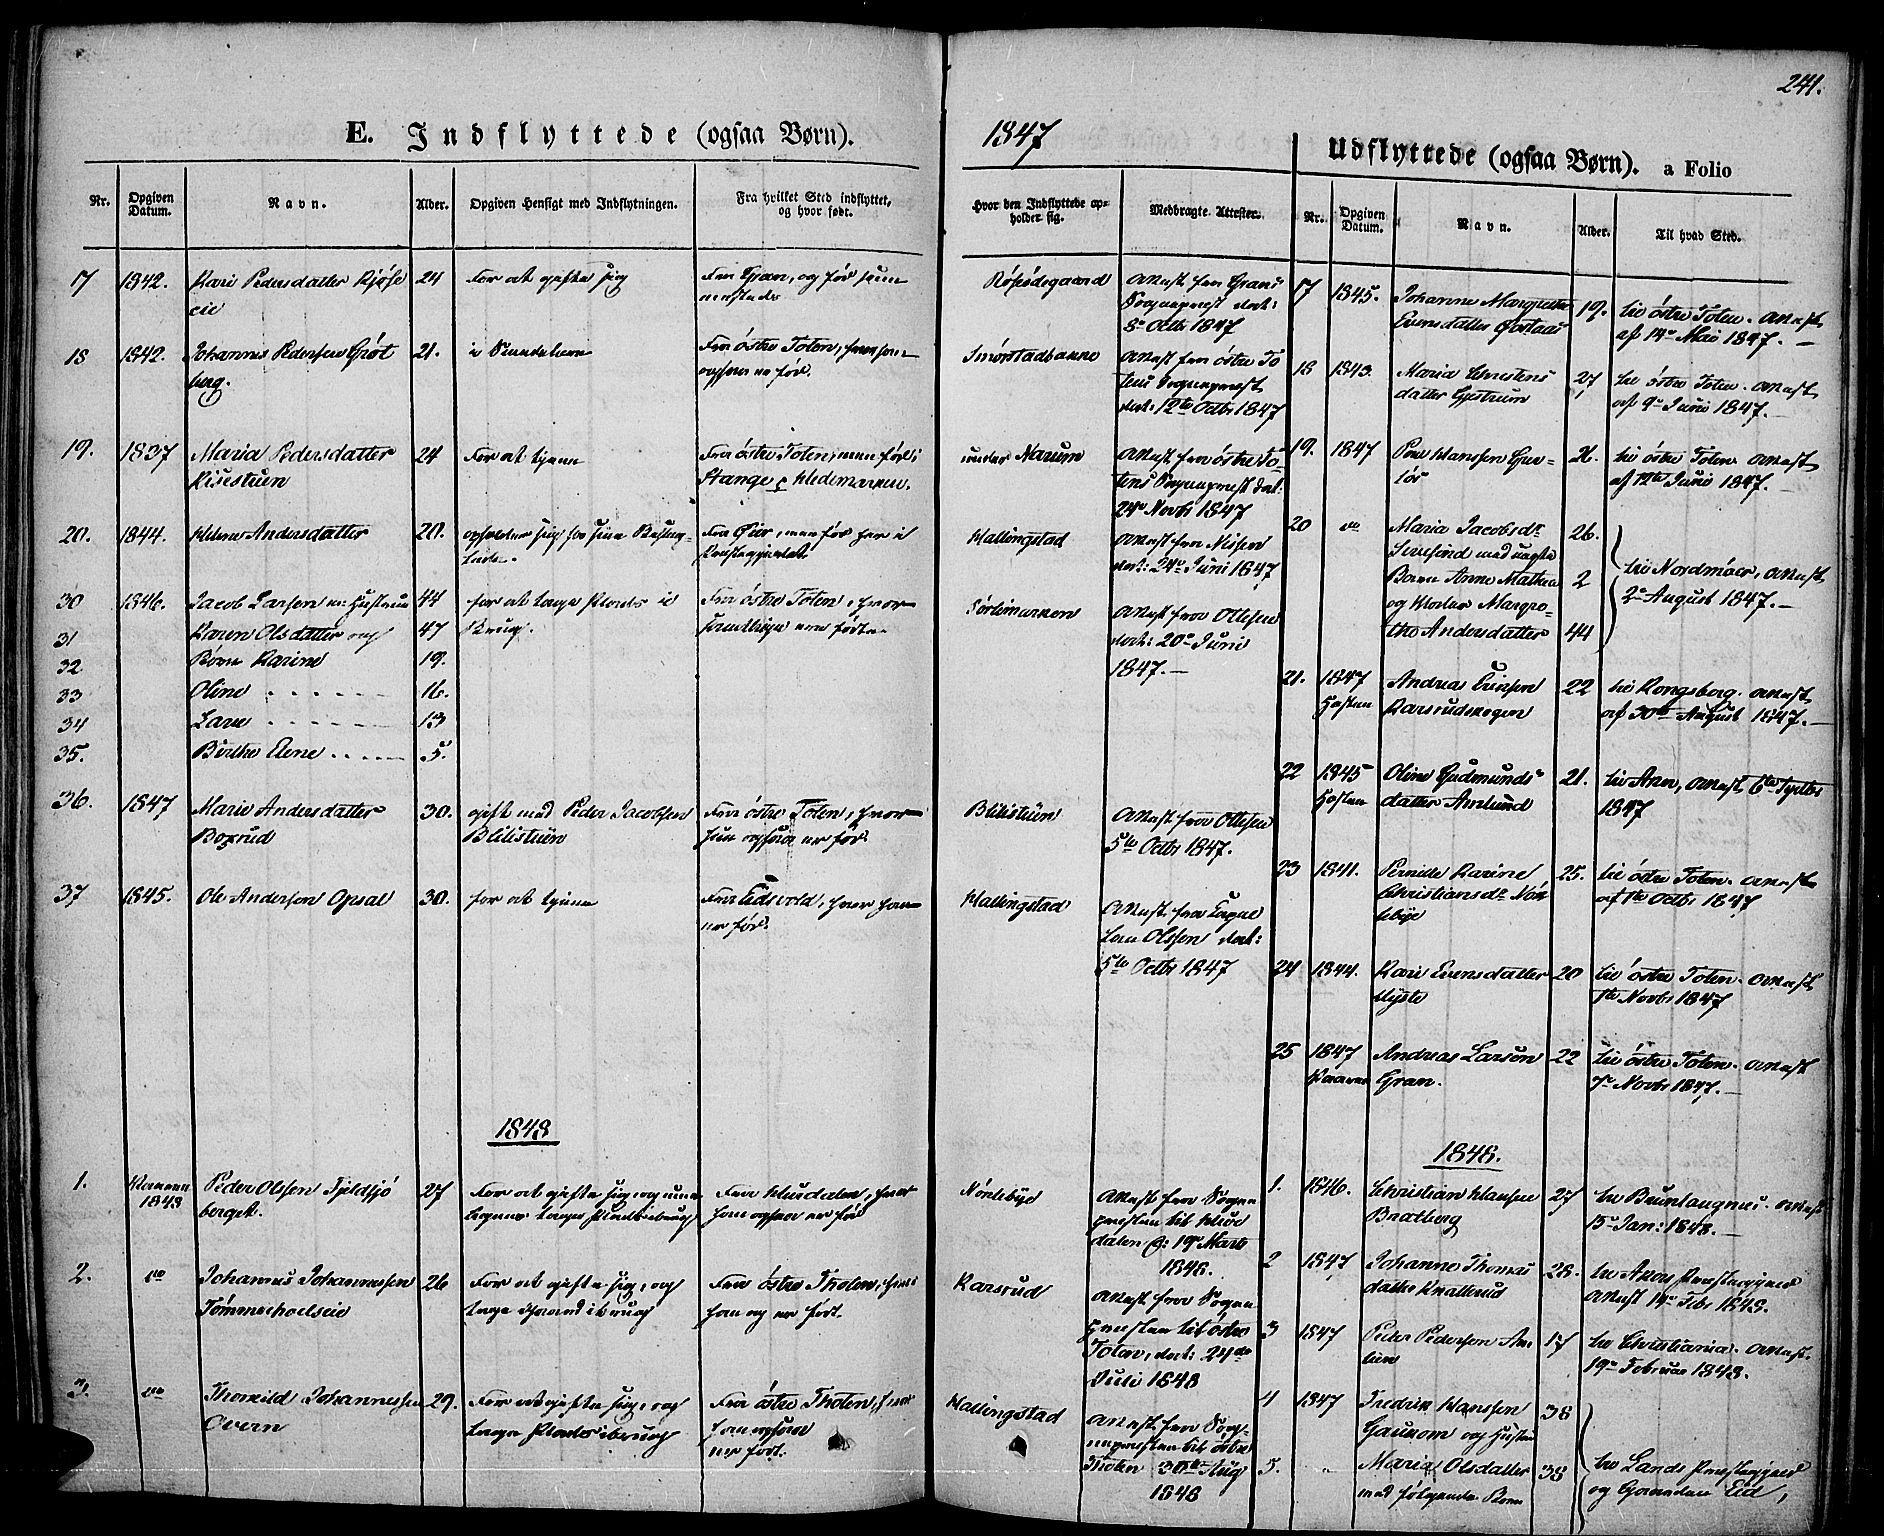 SAH, Vestre Toten prestekontor, H/Ha/Haa/L0004: Ministerialbok nr. 4, 1844-1849, s. 241